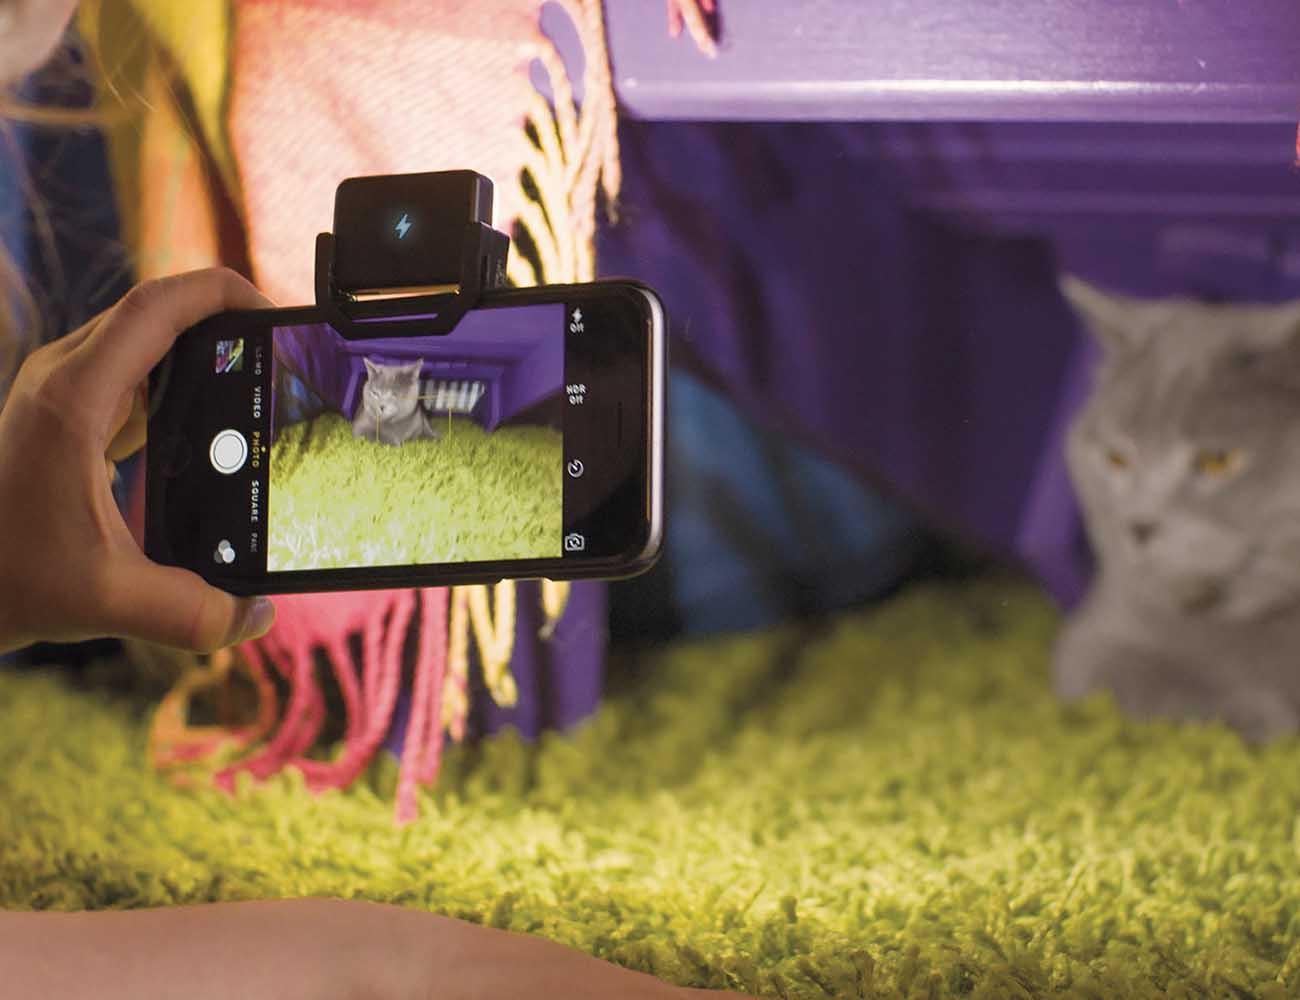 iblazr 2 – The Ultimate Wireless Flash